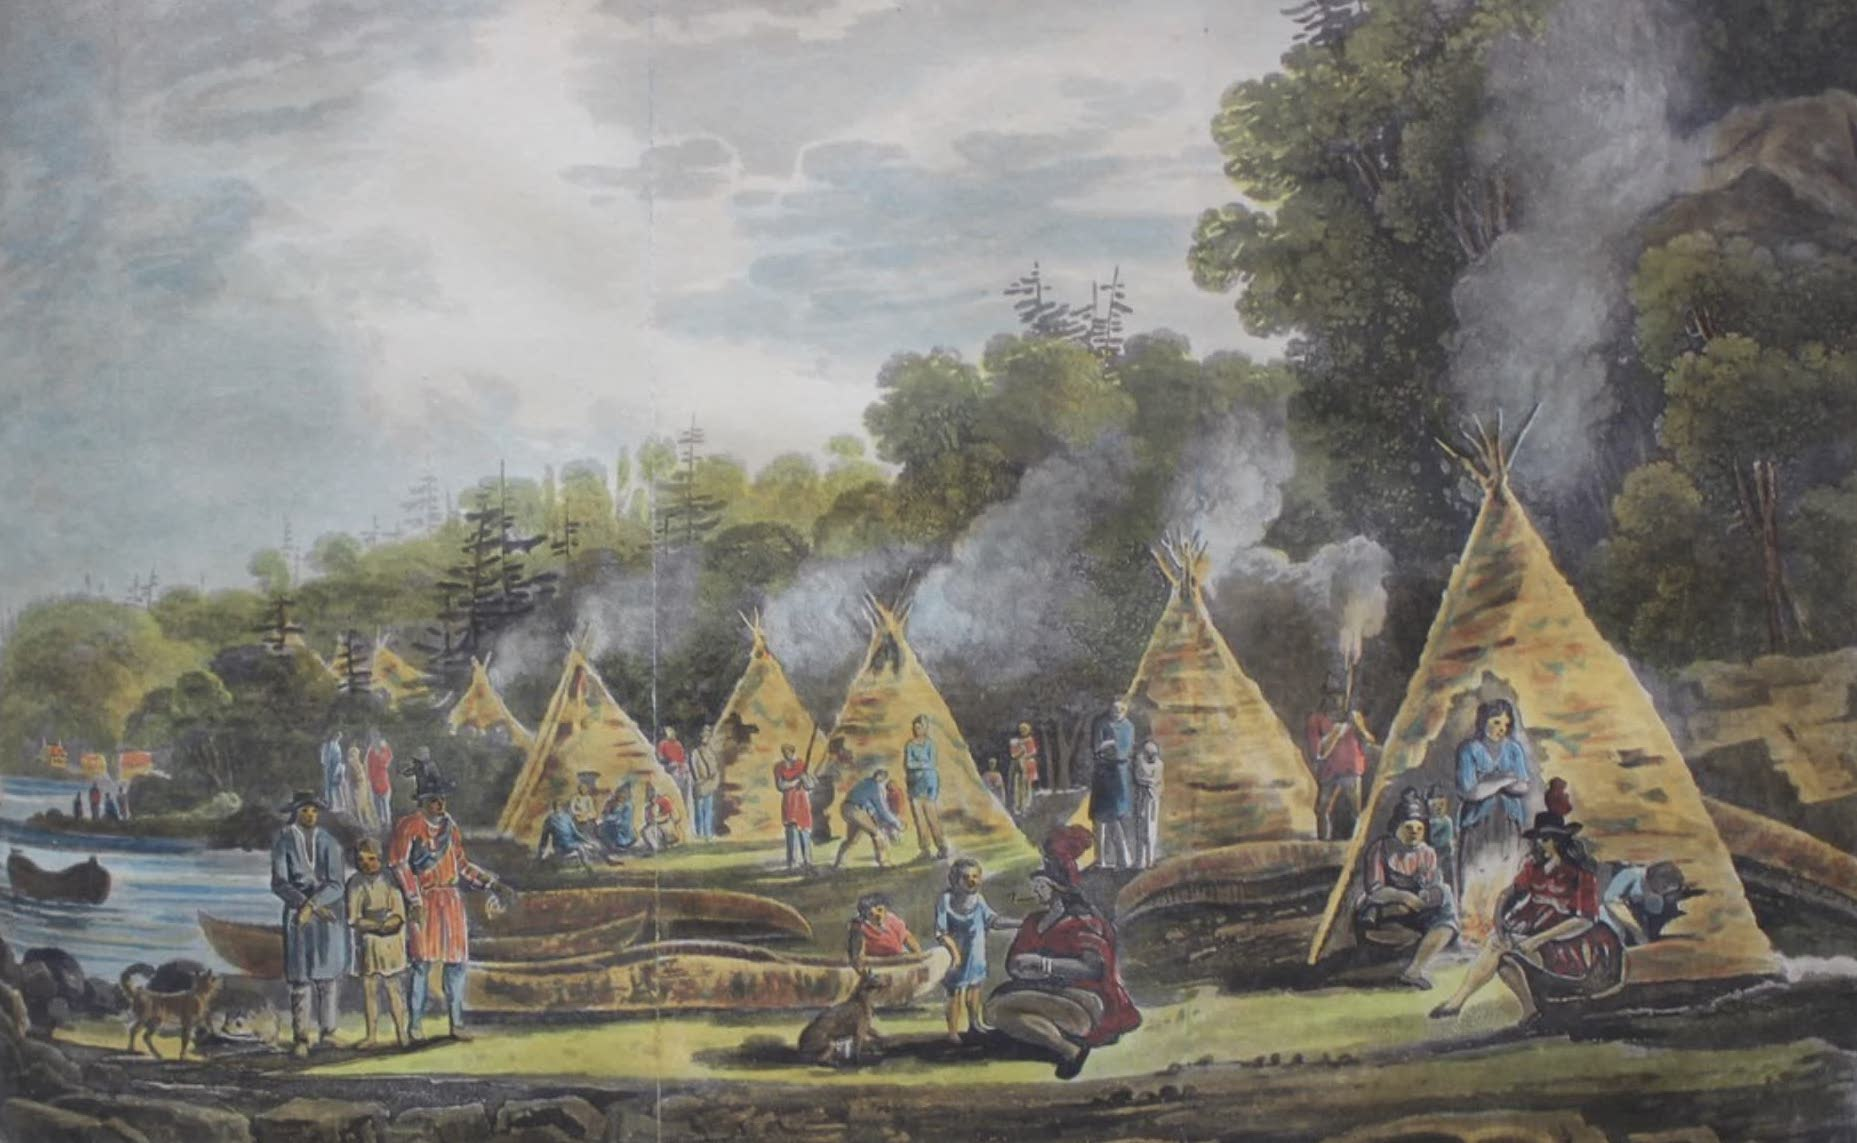 Travels Through the Canadas - Encampment of Domiciliated Indians (1807)